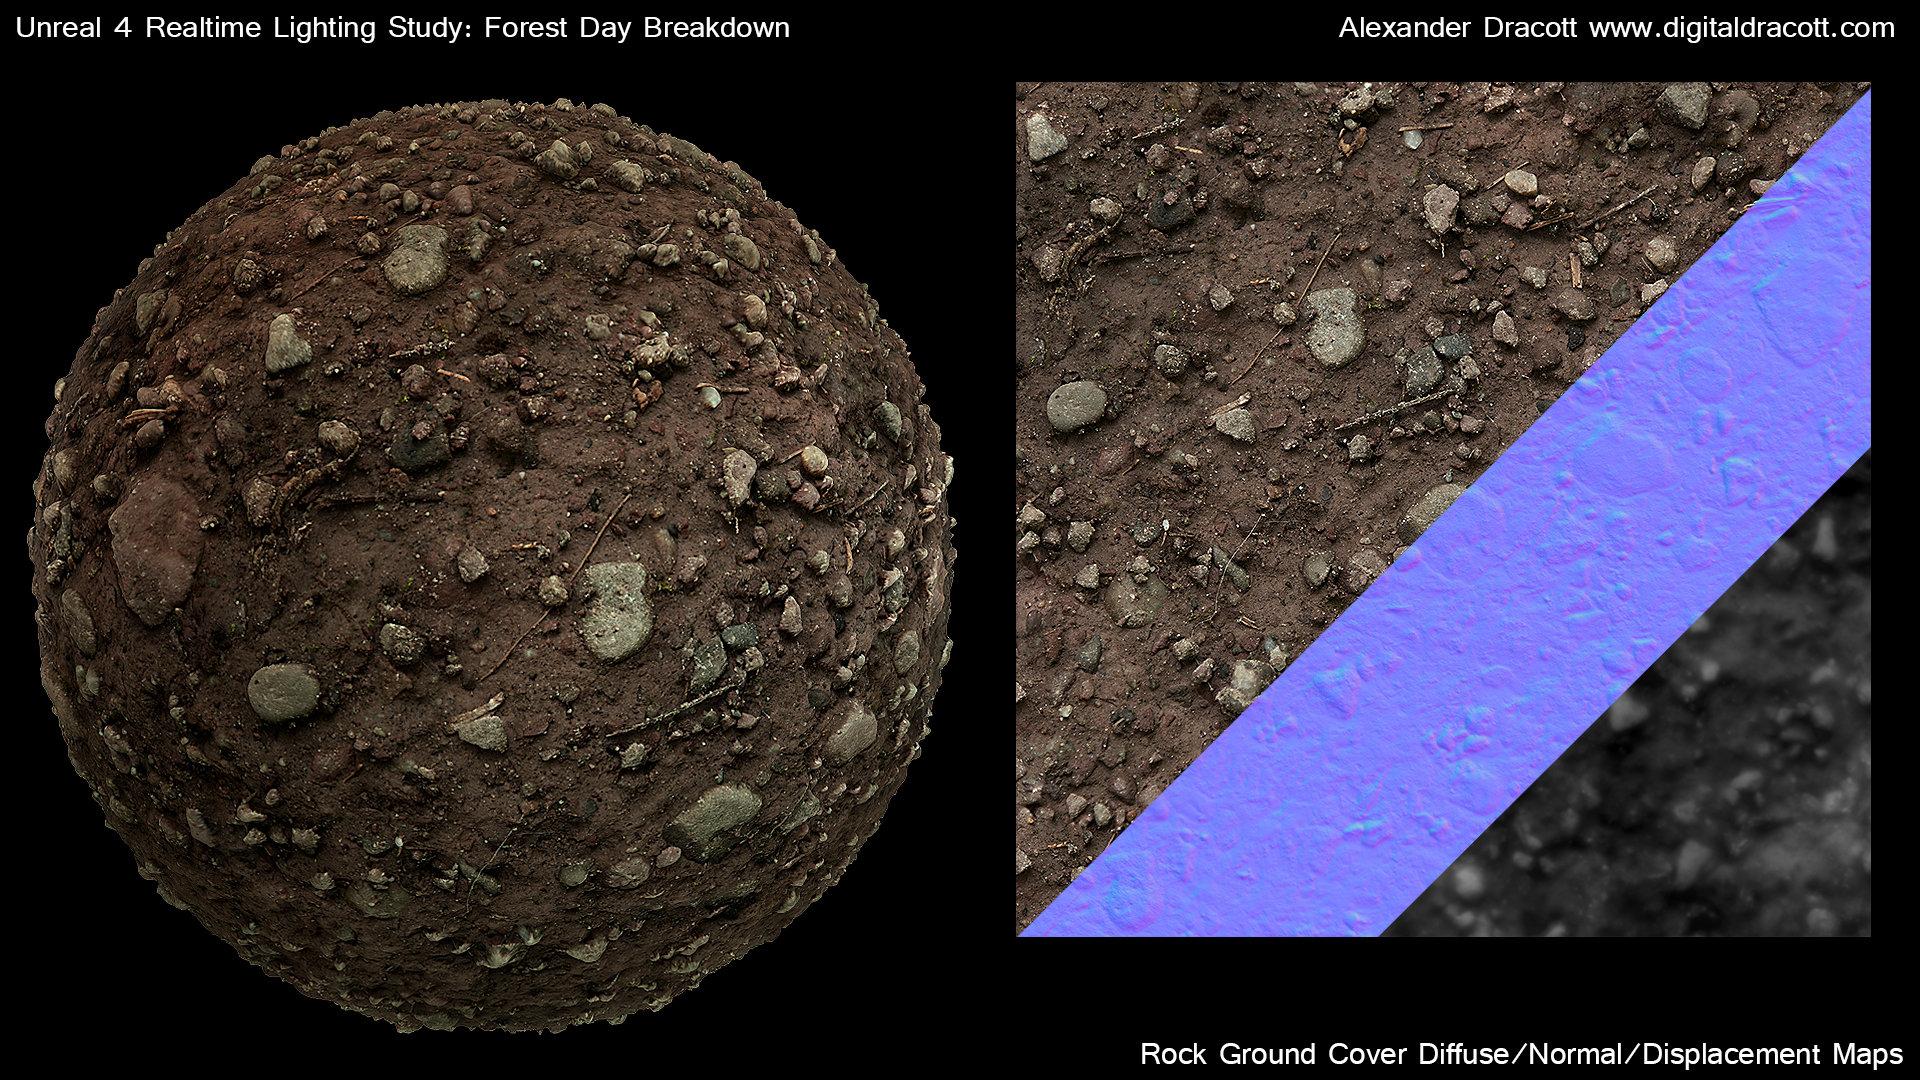 Alexander dracott forestbreakdown texturegroundrocks